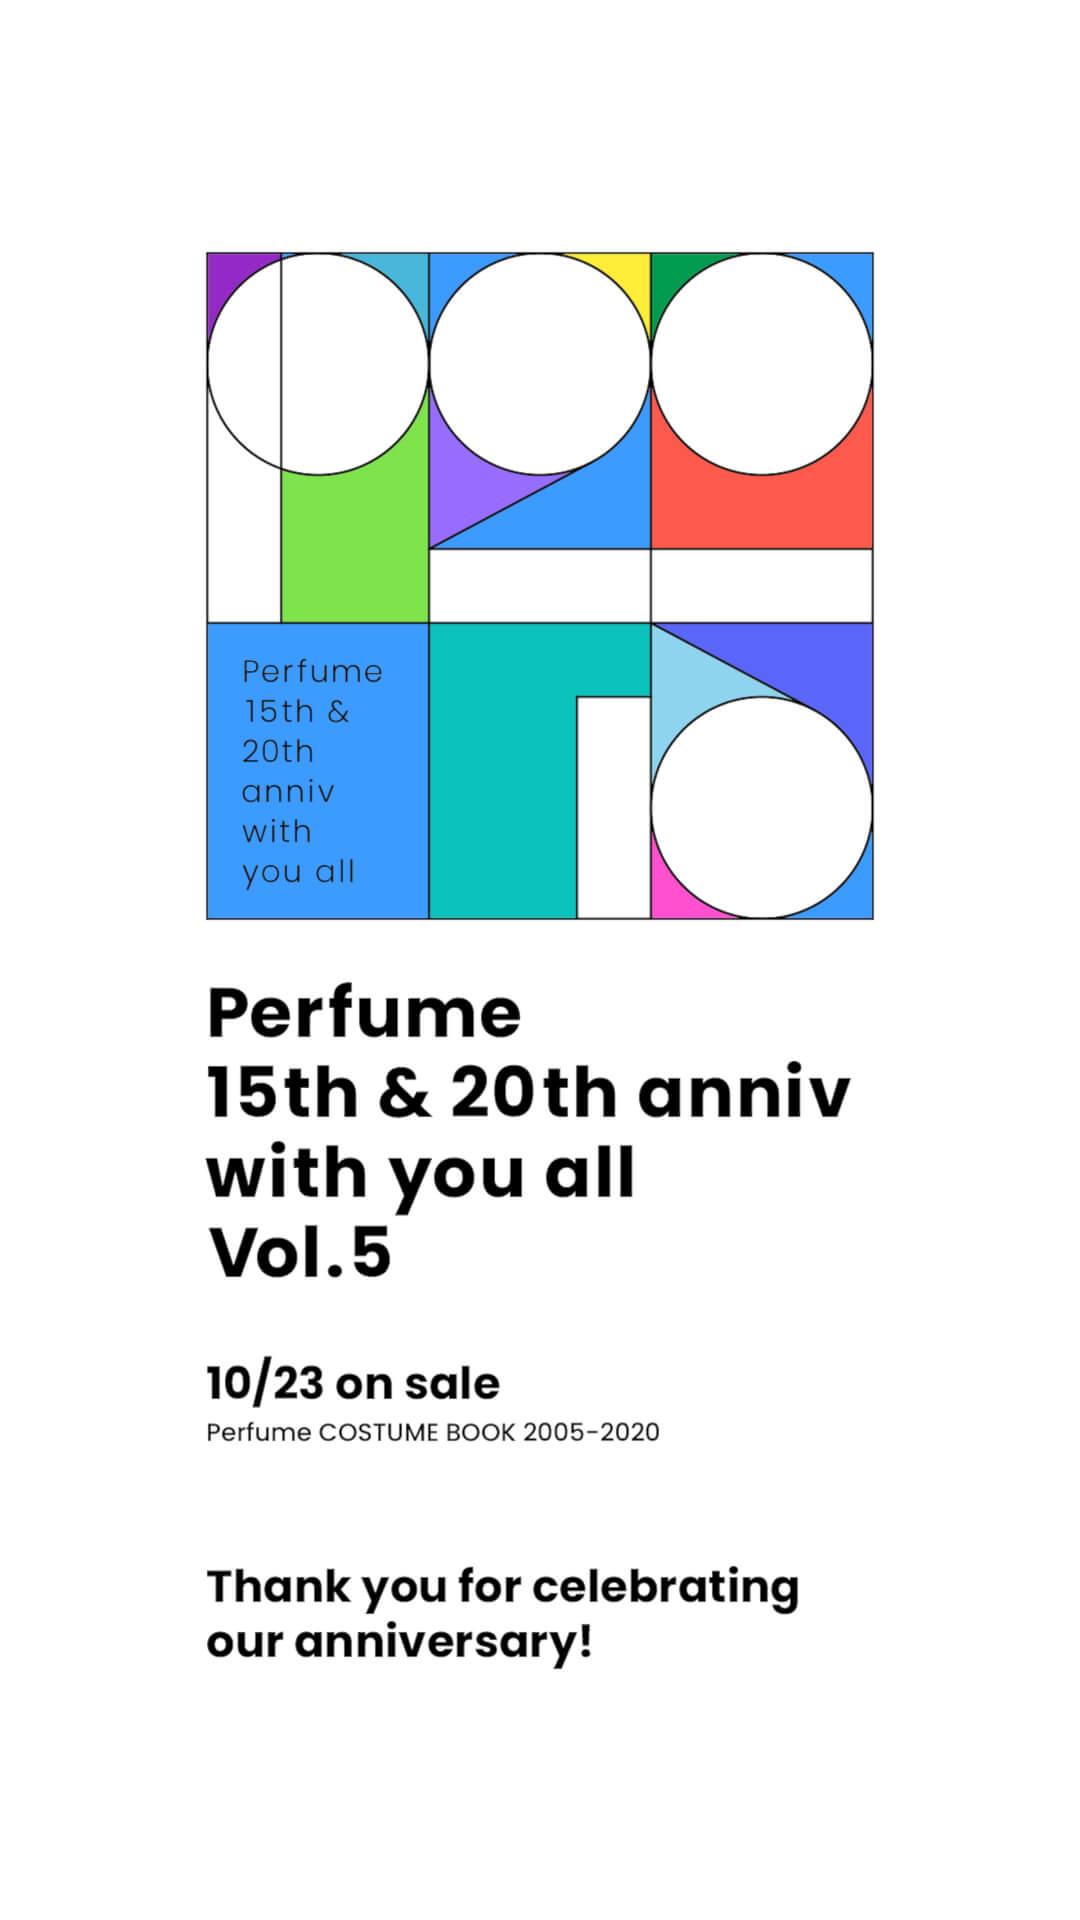 Perfume初の衣装本が『Perfume COSTUME BOOK 2005-2020』発売決定!6つの周年事業すべて発表 music200918_perfume_2